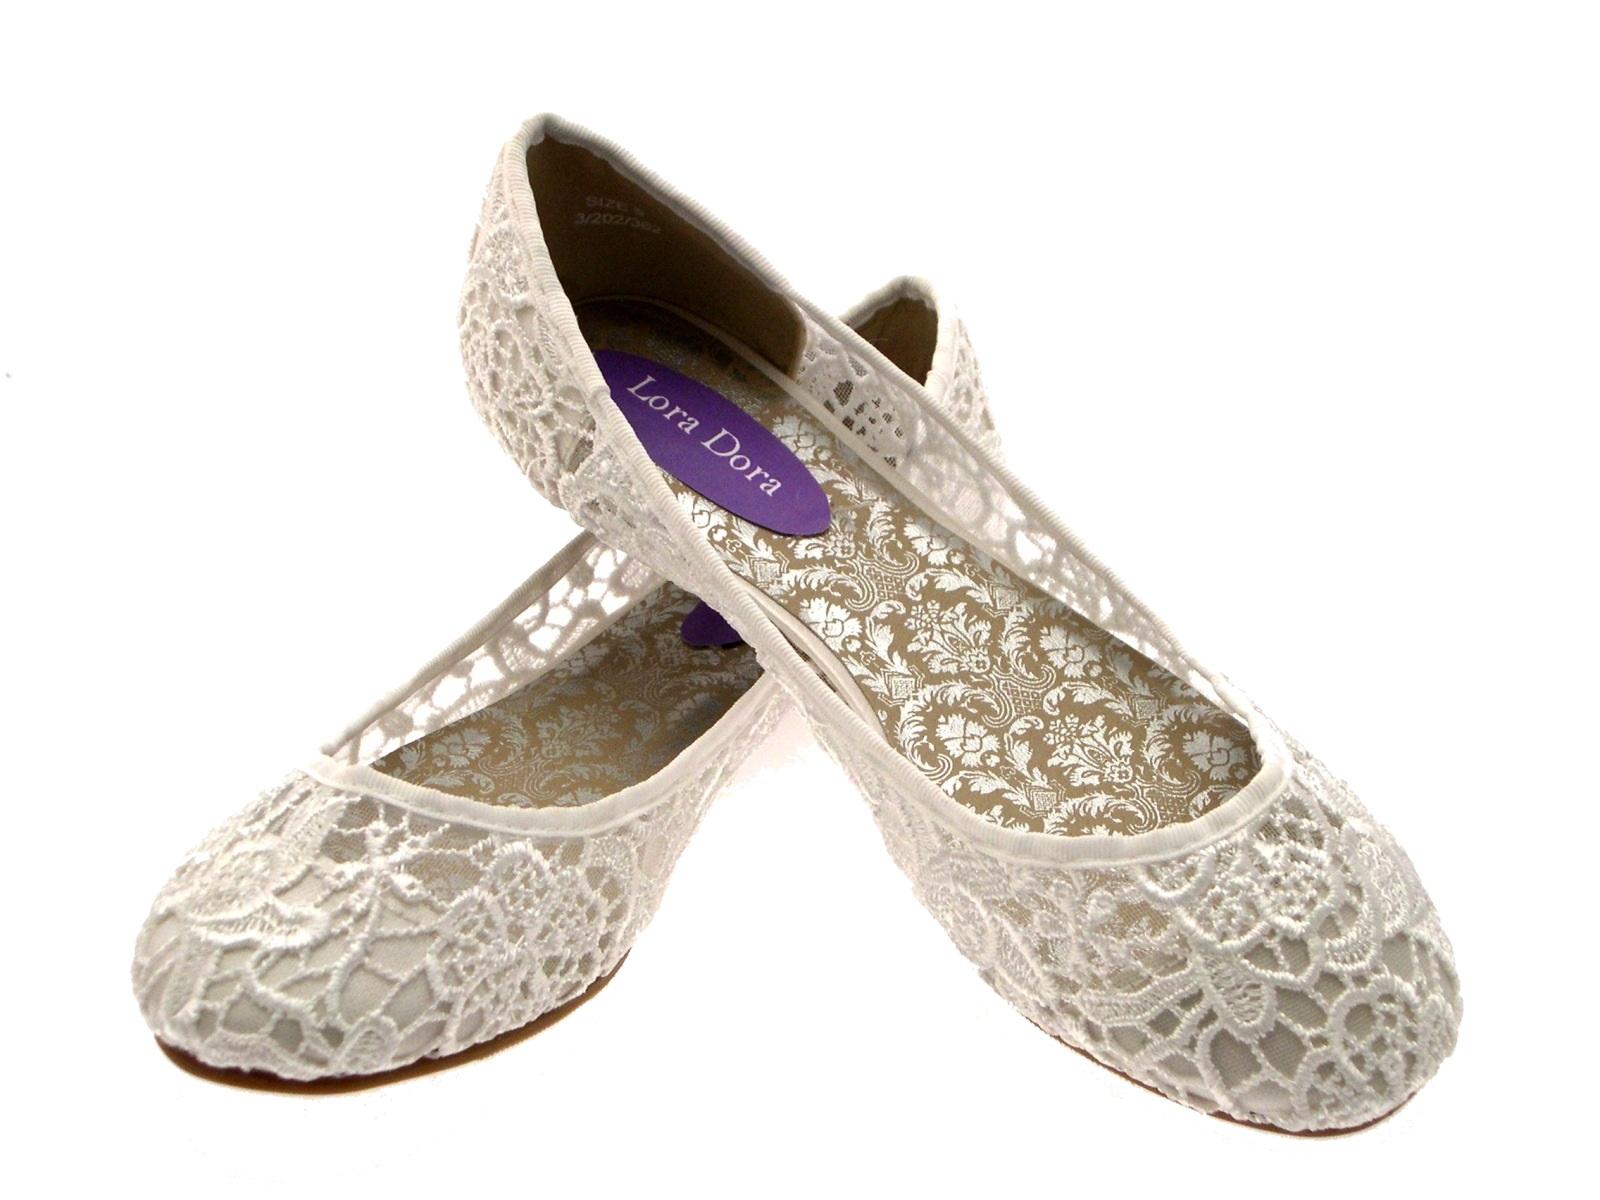 Womens Ivory Lace Ballet Pumps Flat Bridal Bridesmaid Shoes Ladies Size UK 3 - 8 | EBay